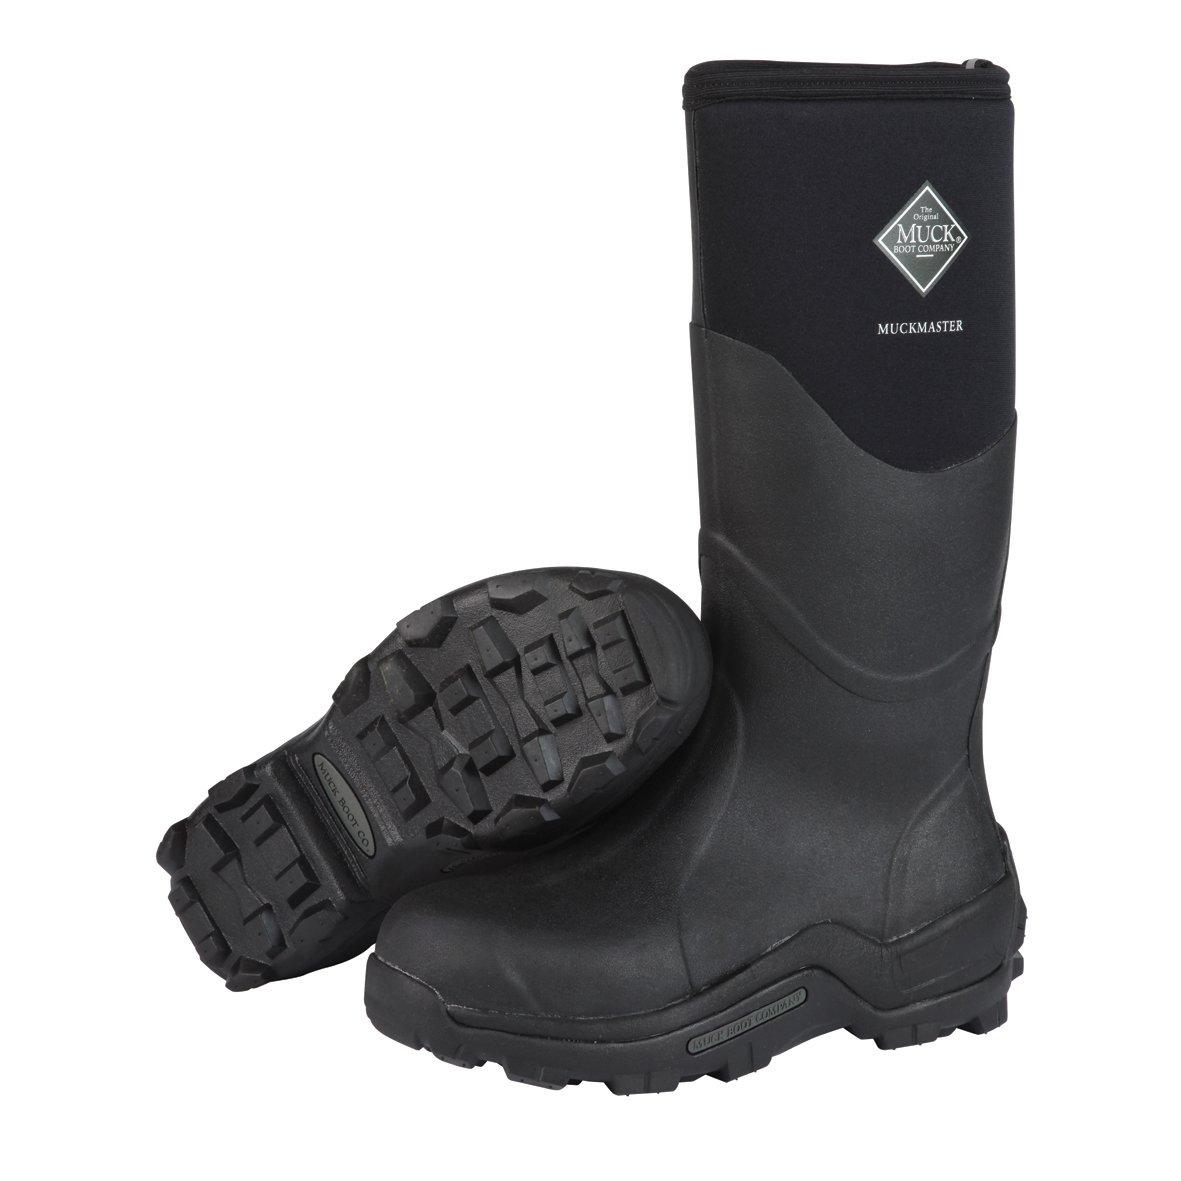 Muck Boot Adult MuckMaster Hi-Cut Boot B000WG663W Men's 9 M/Women's 10 M|Black